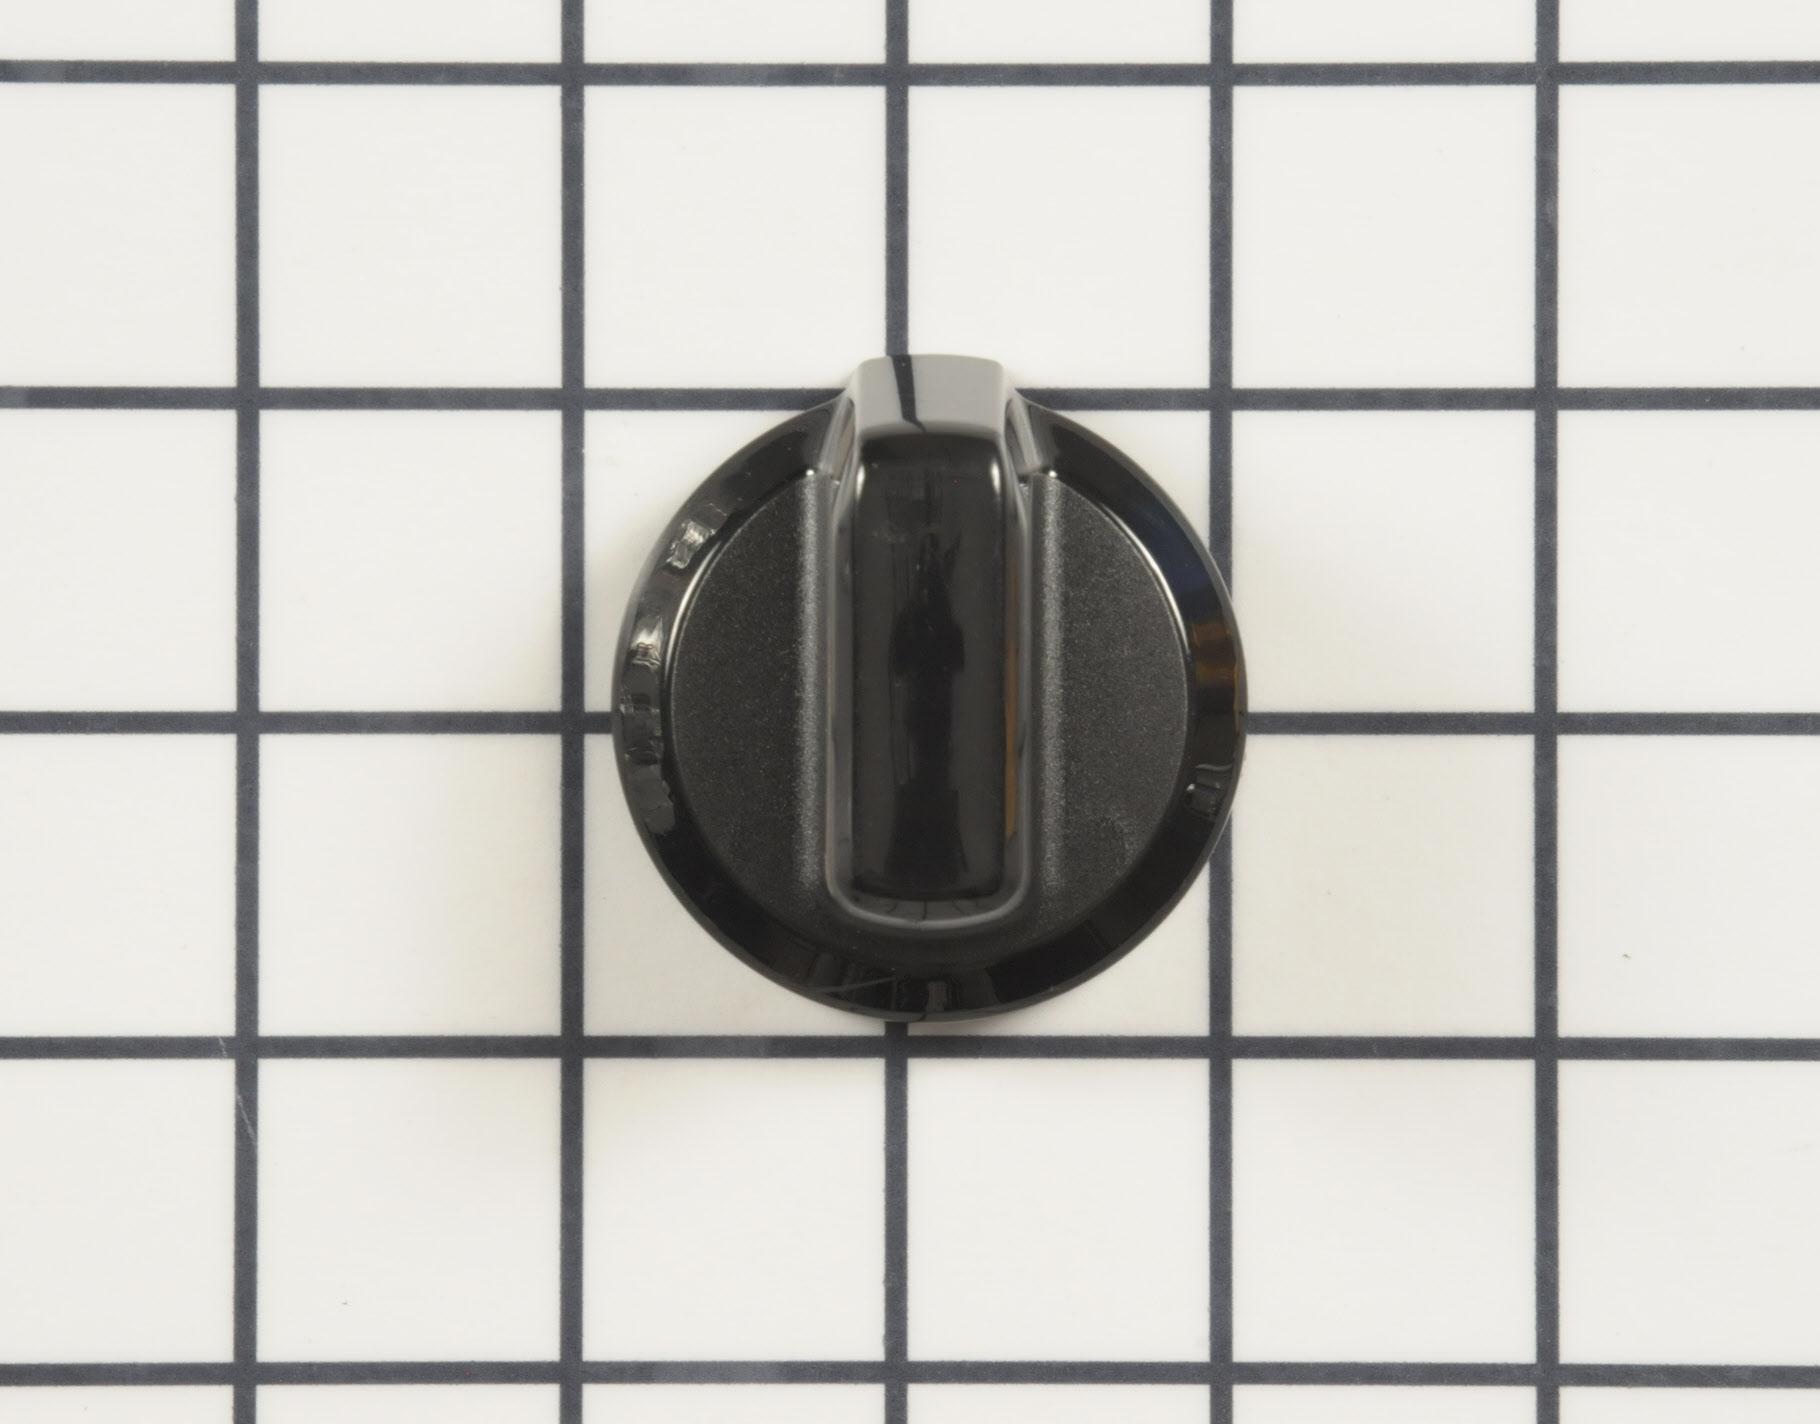 Maytag Range/Stove/Oven Part # W10244659 - Knob